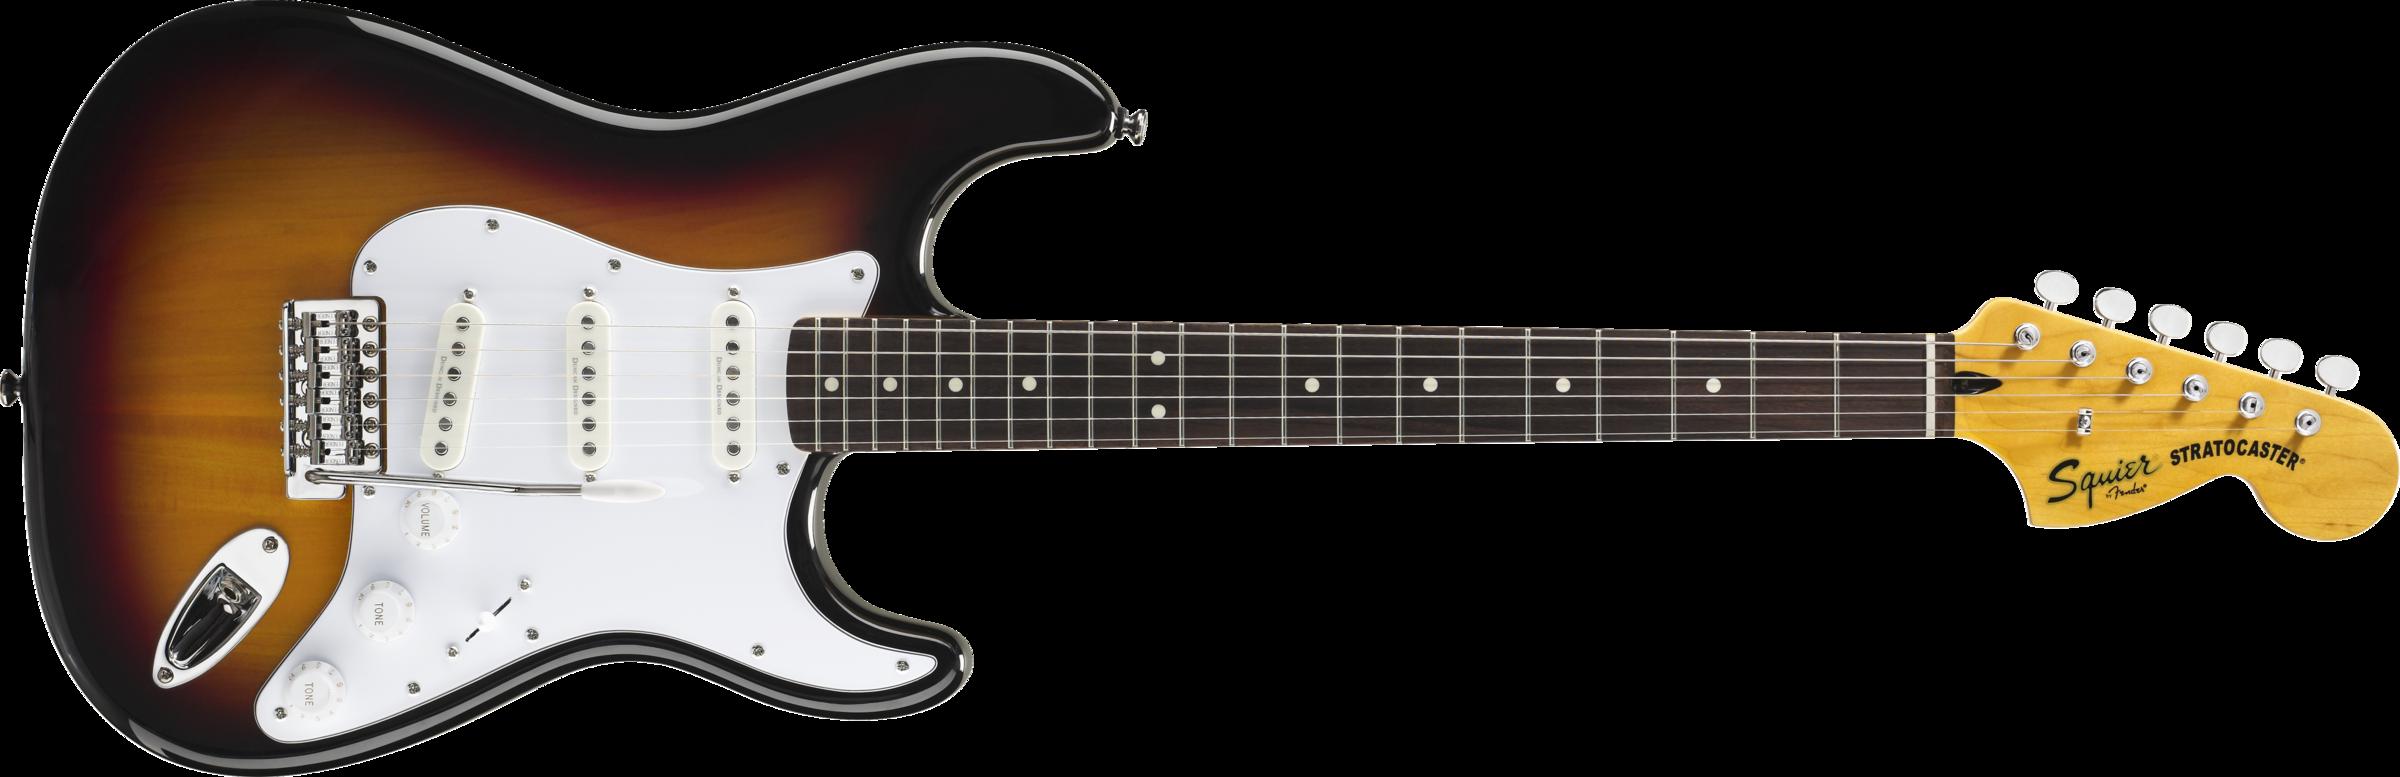 American Vintage '62 Stratocaster Fender - Audiofanzine